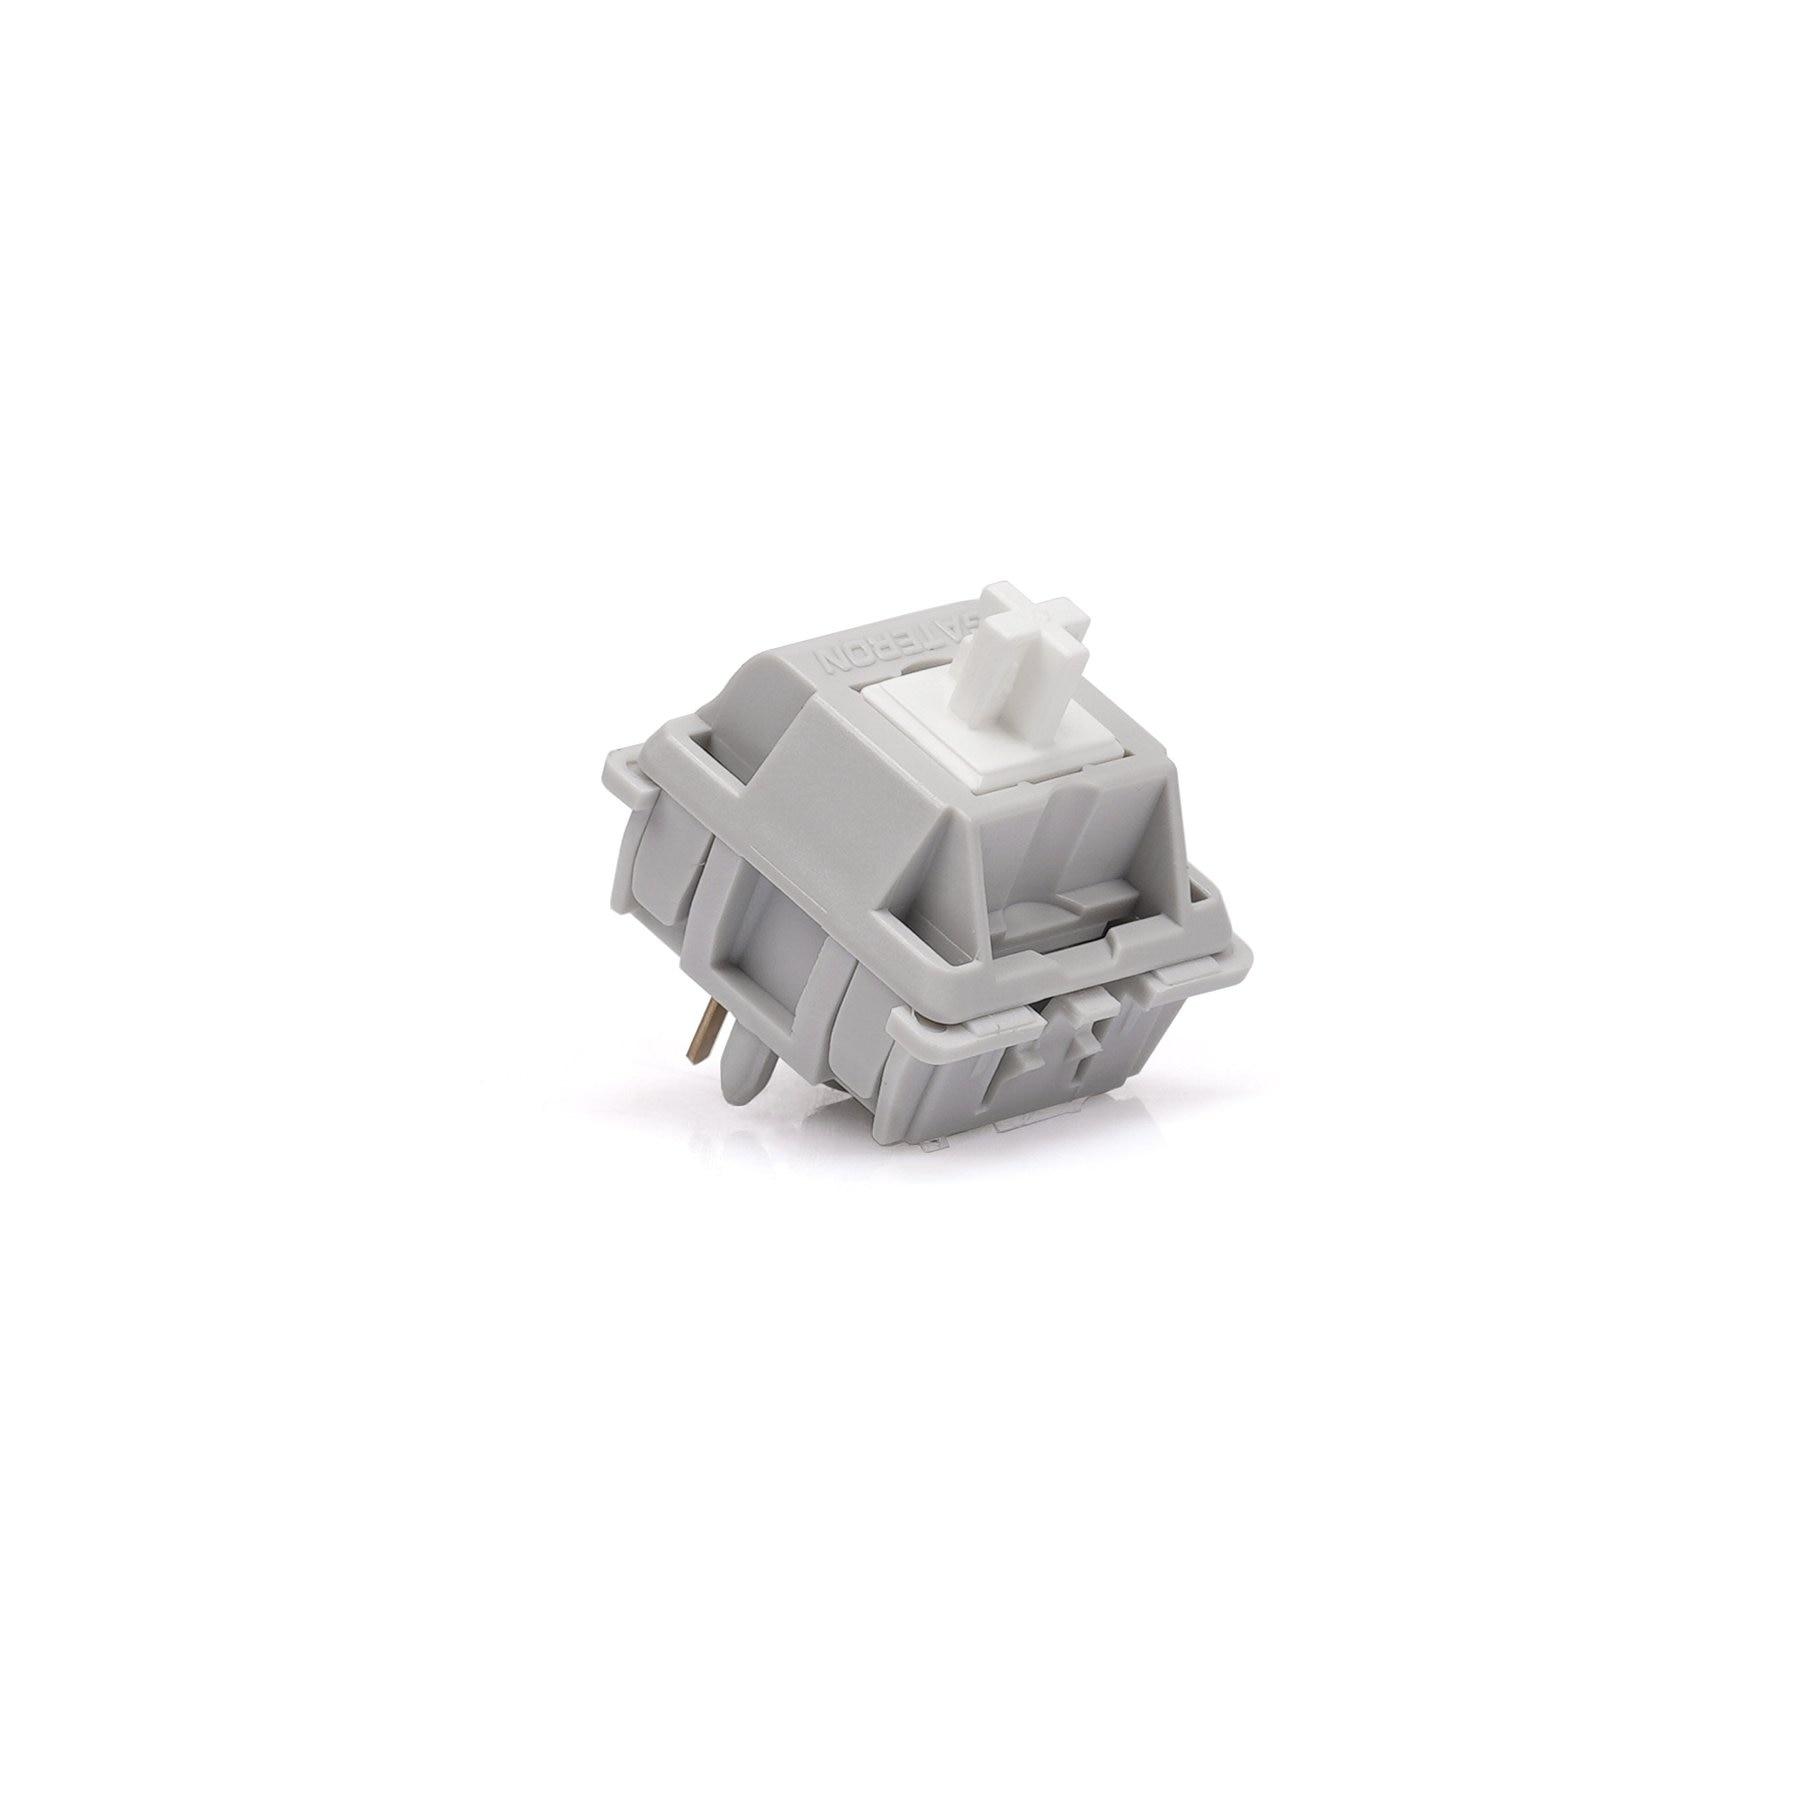 Gateron مفاتيح عاصفة ثلجية فضية للوحة المفاتيح الميكانيكية لتقوم بها بنفسك